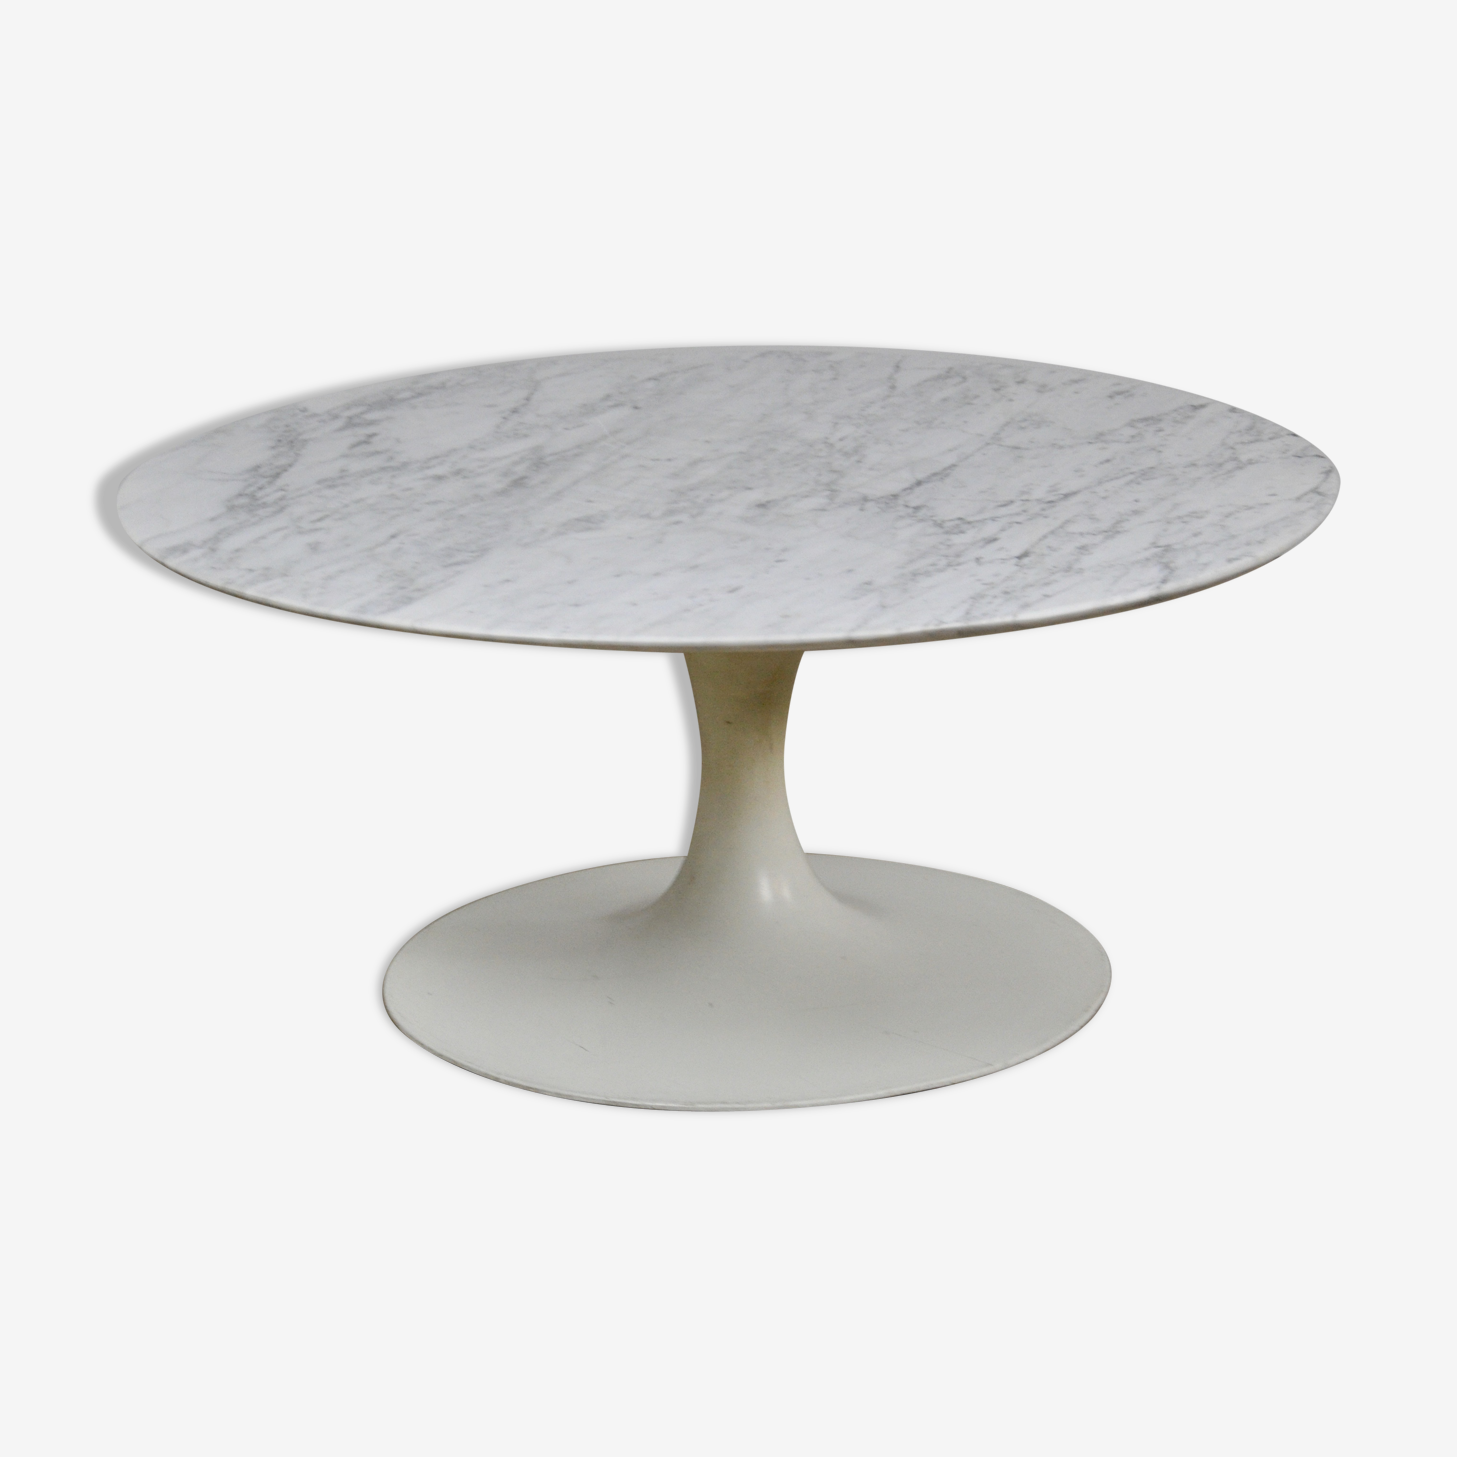 Table basse en marbre de Carrare 1960s